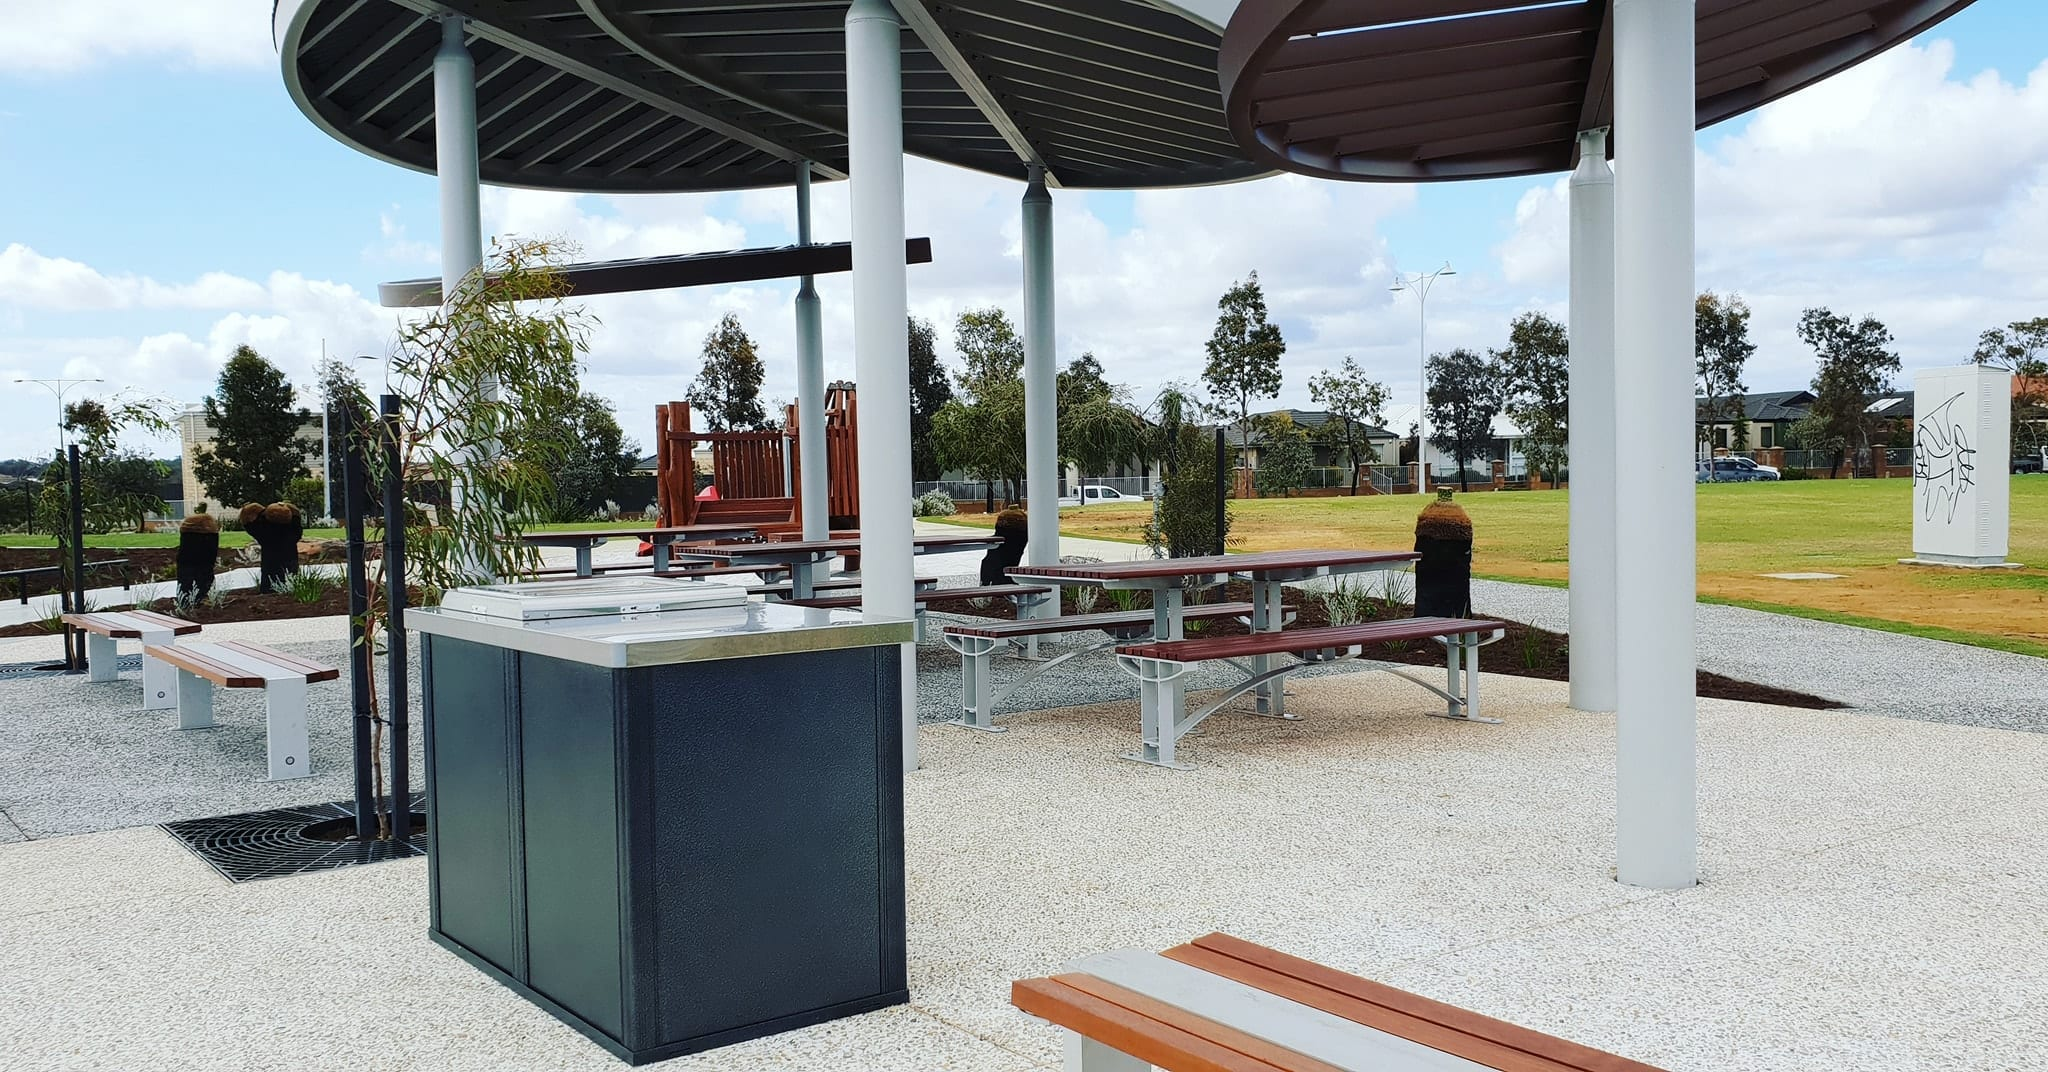 Banksia Grove Skate Park